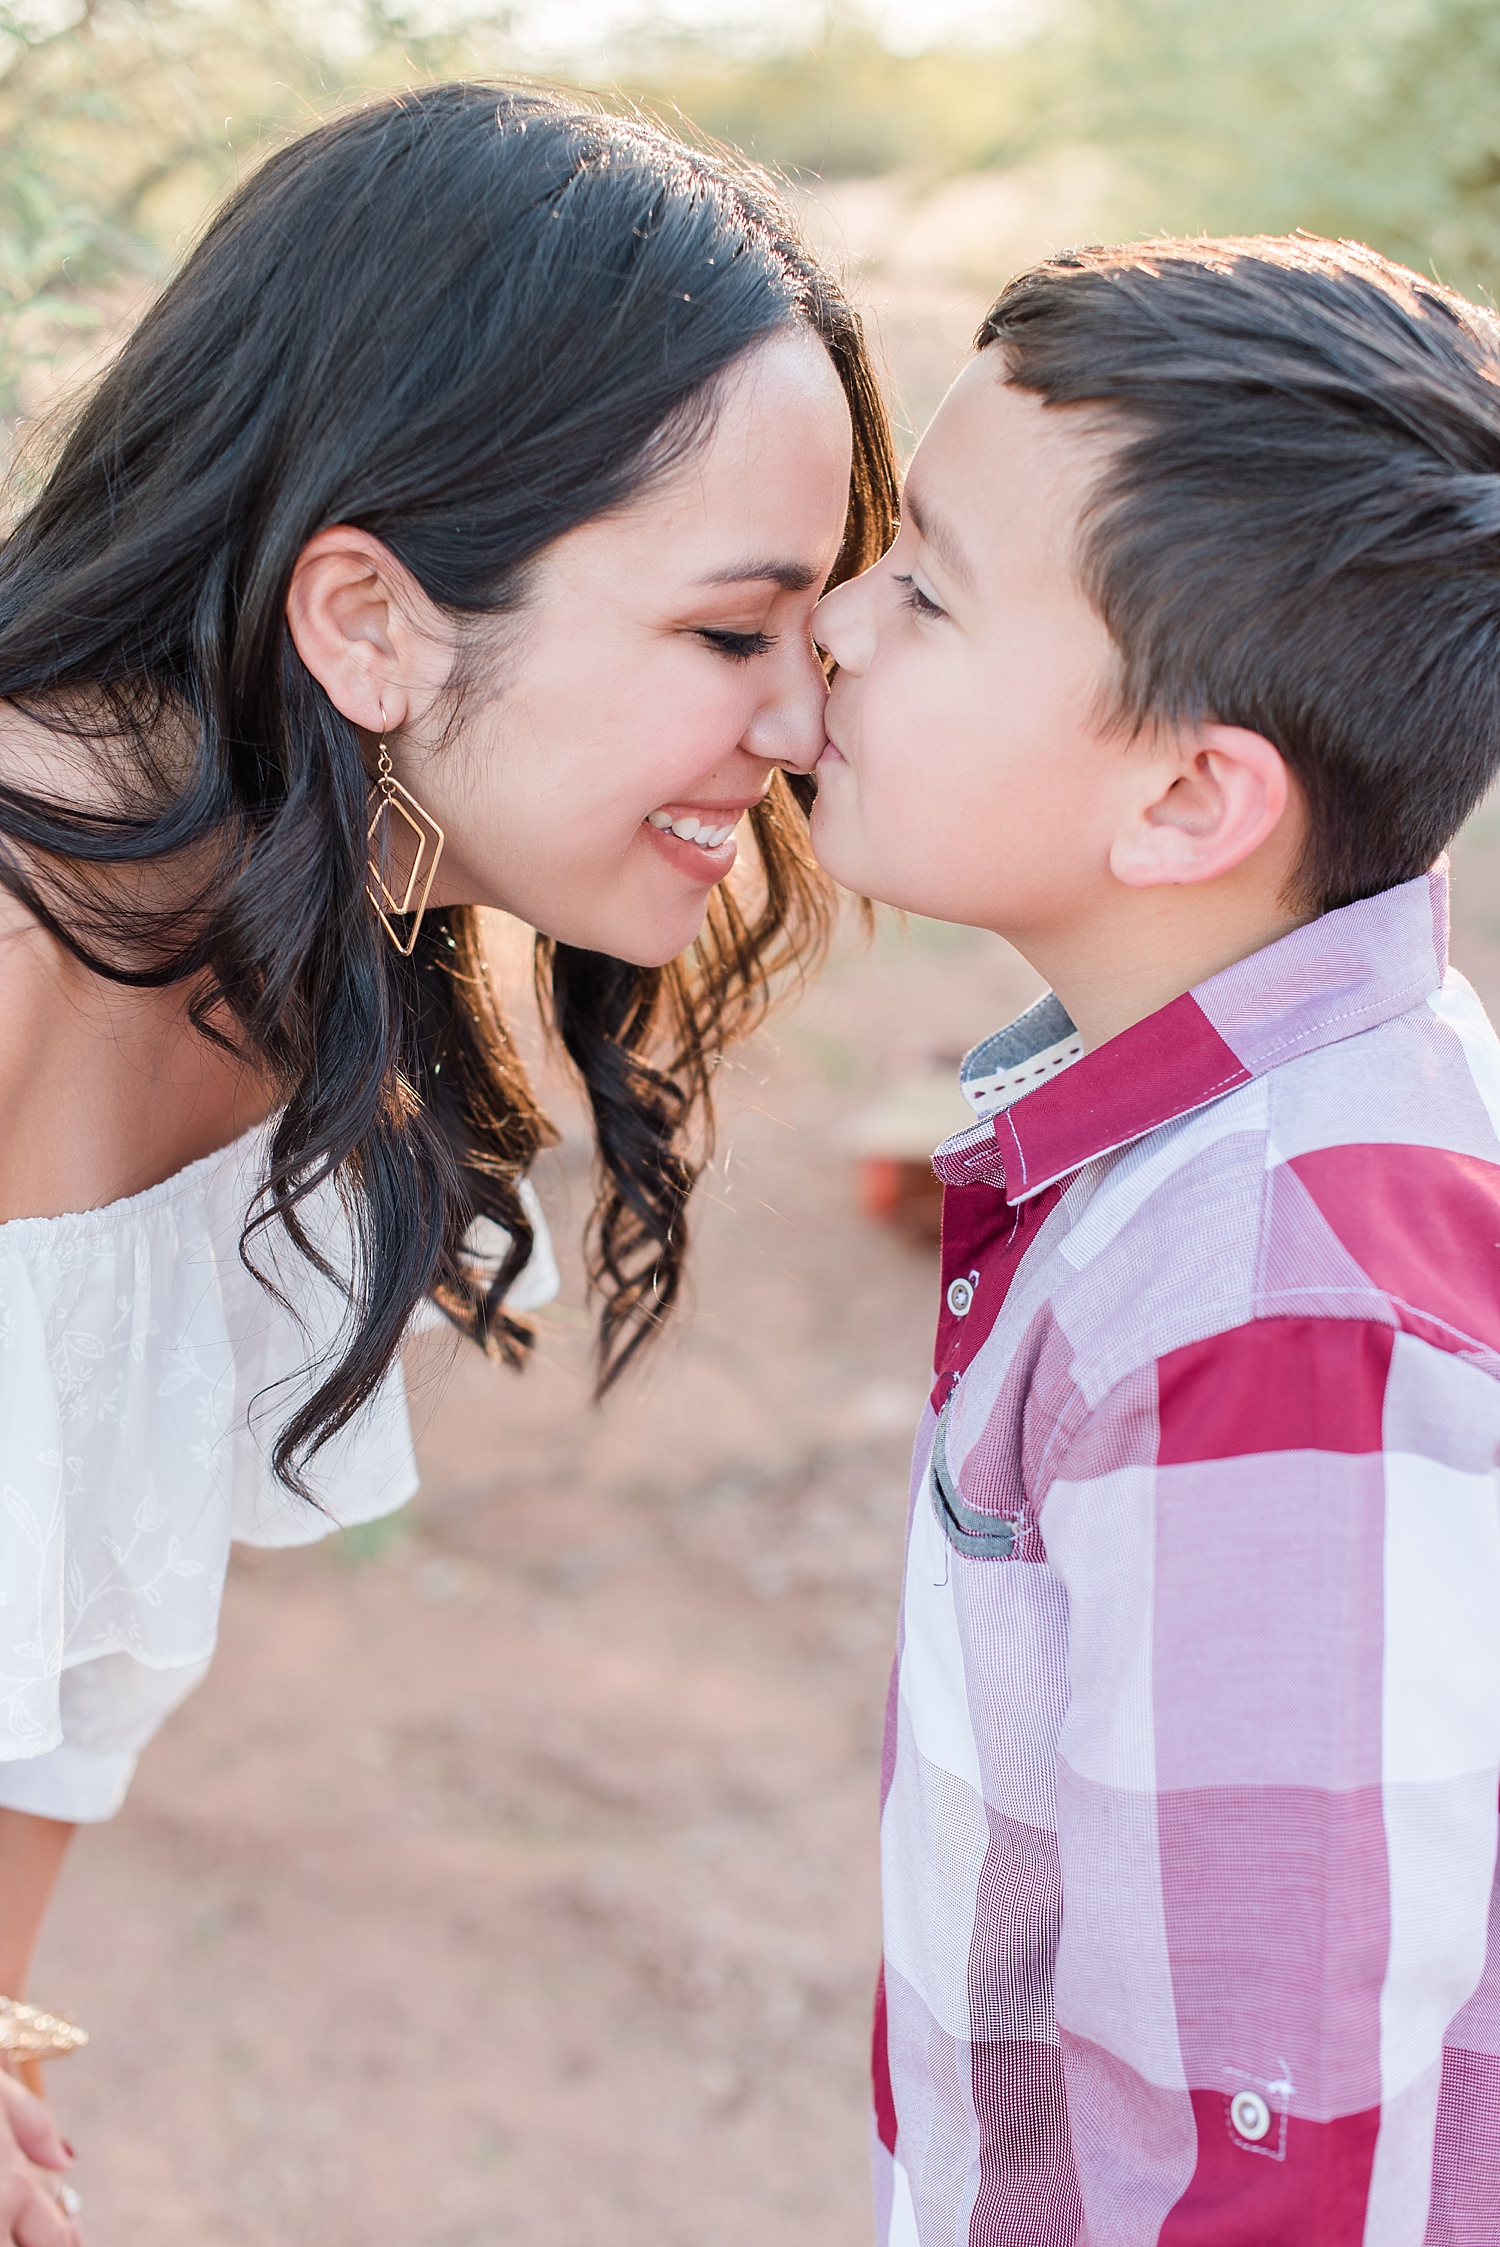 Rodriguez family photo session at Papago Park in Phoenix,  Arizona. Photos by Jade Min Photography.